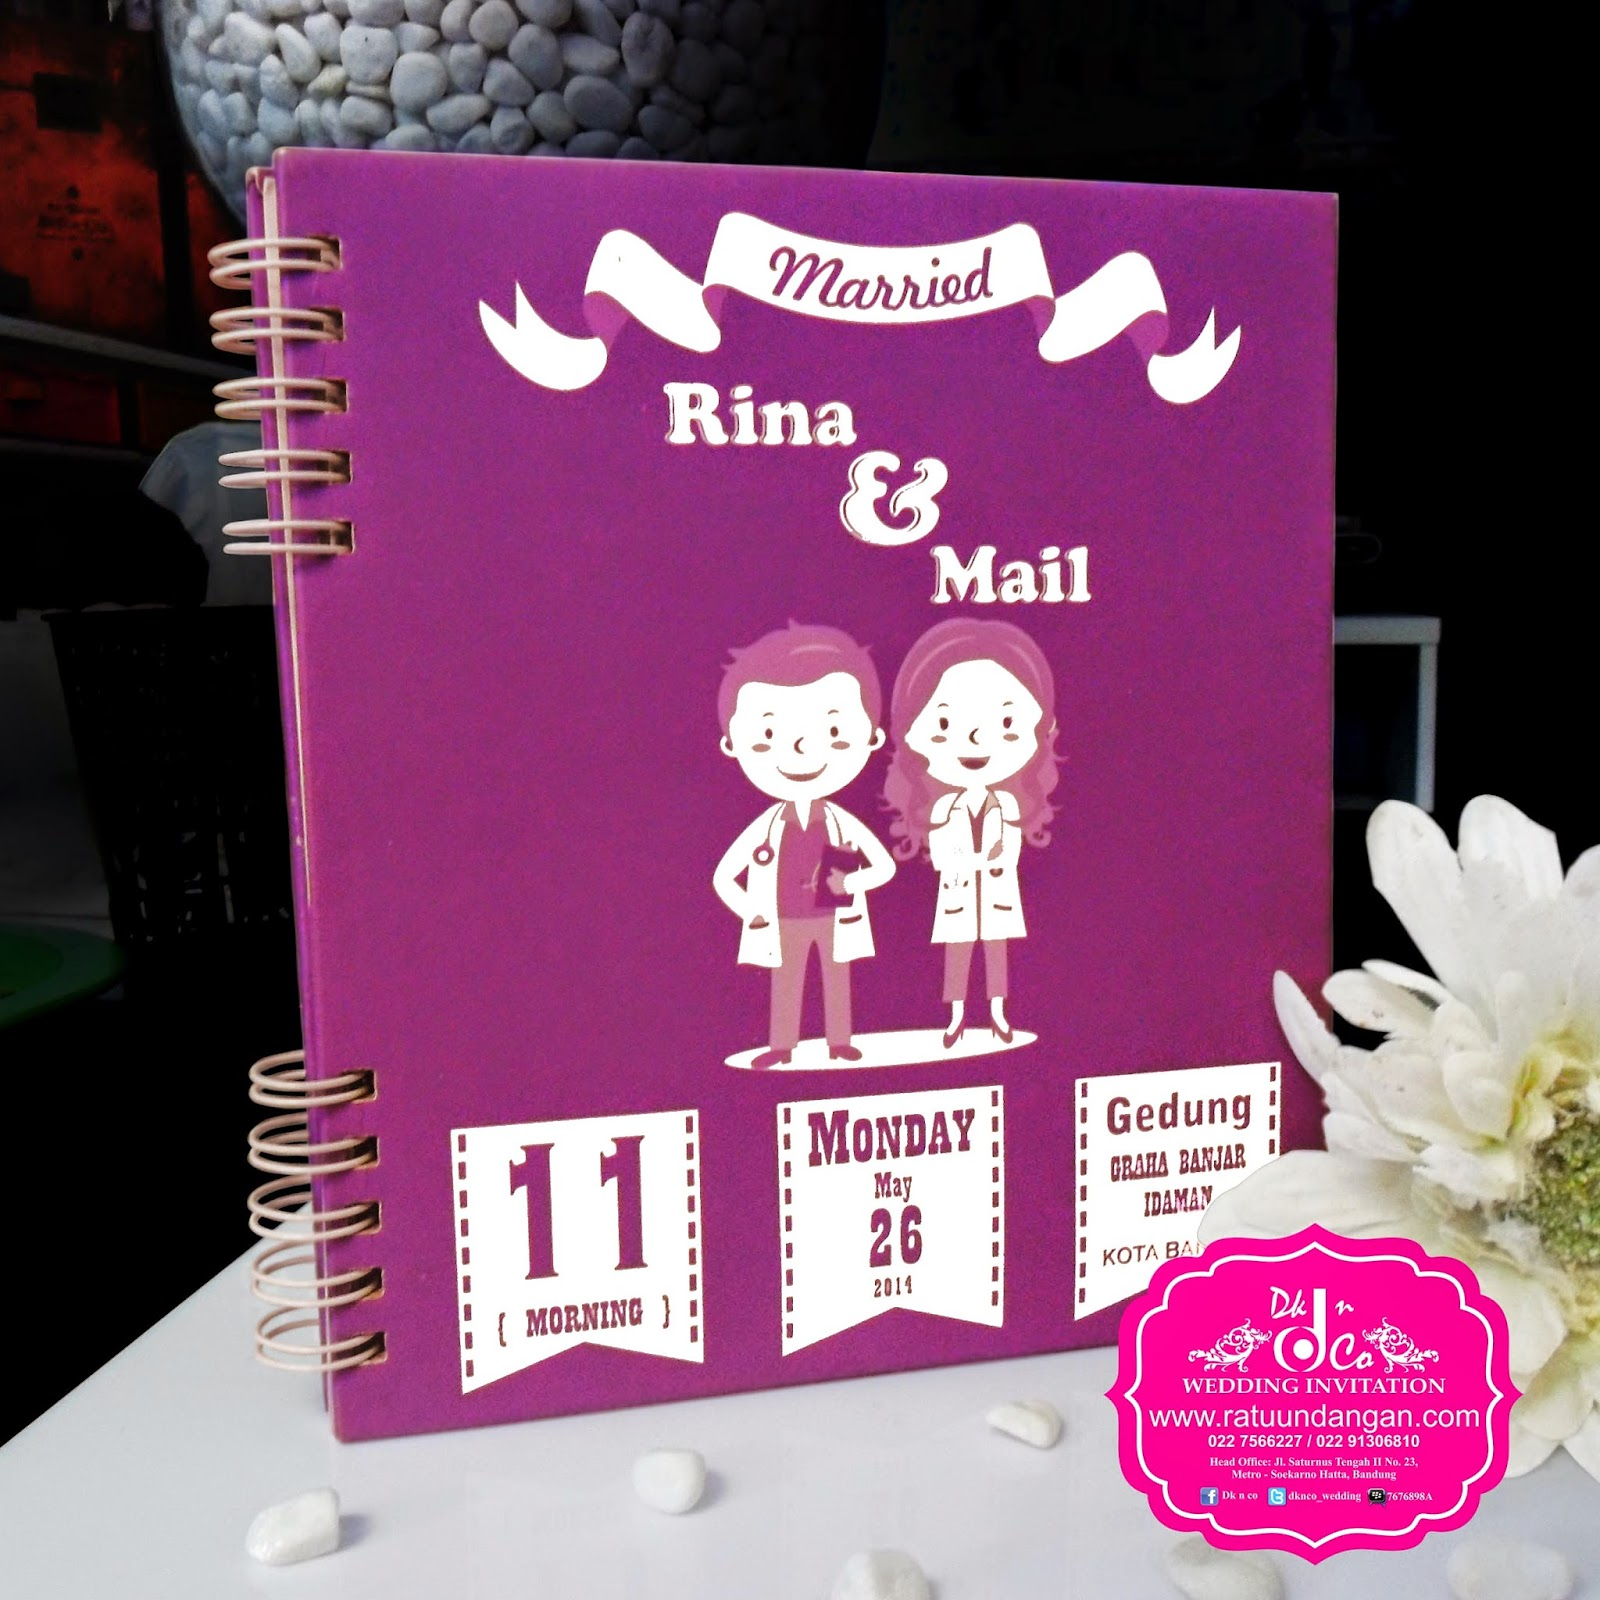 Kartu Undangan Pernikahan Murah Undangan Pernikahan Rina Mail